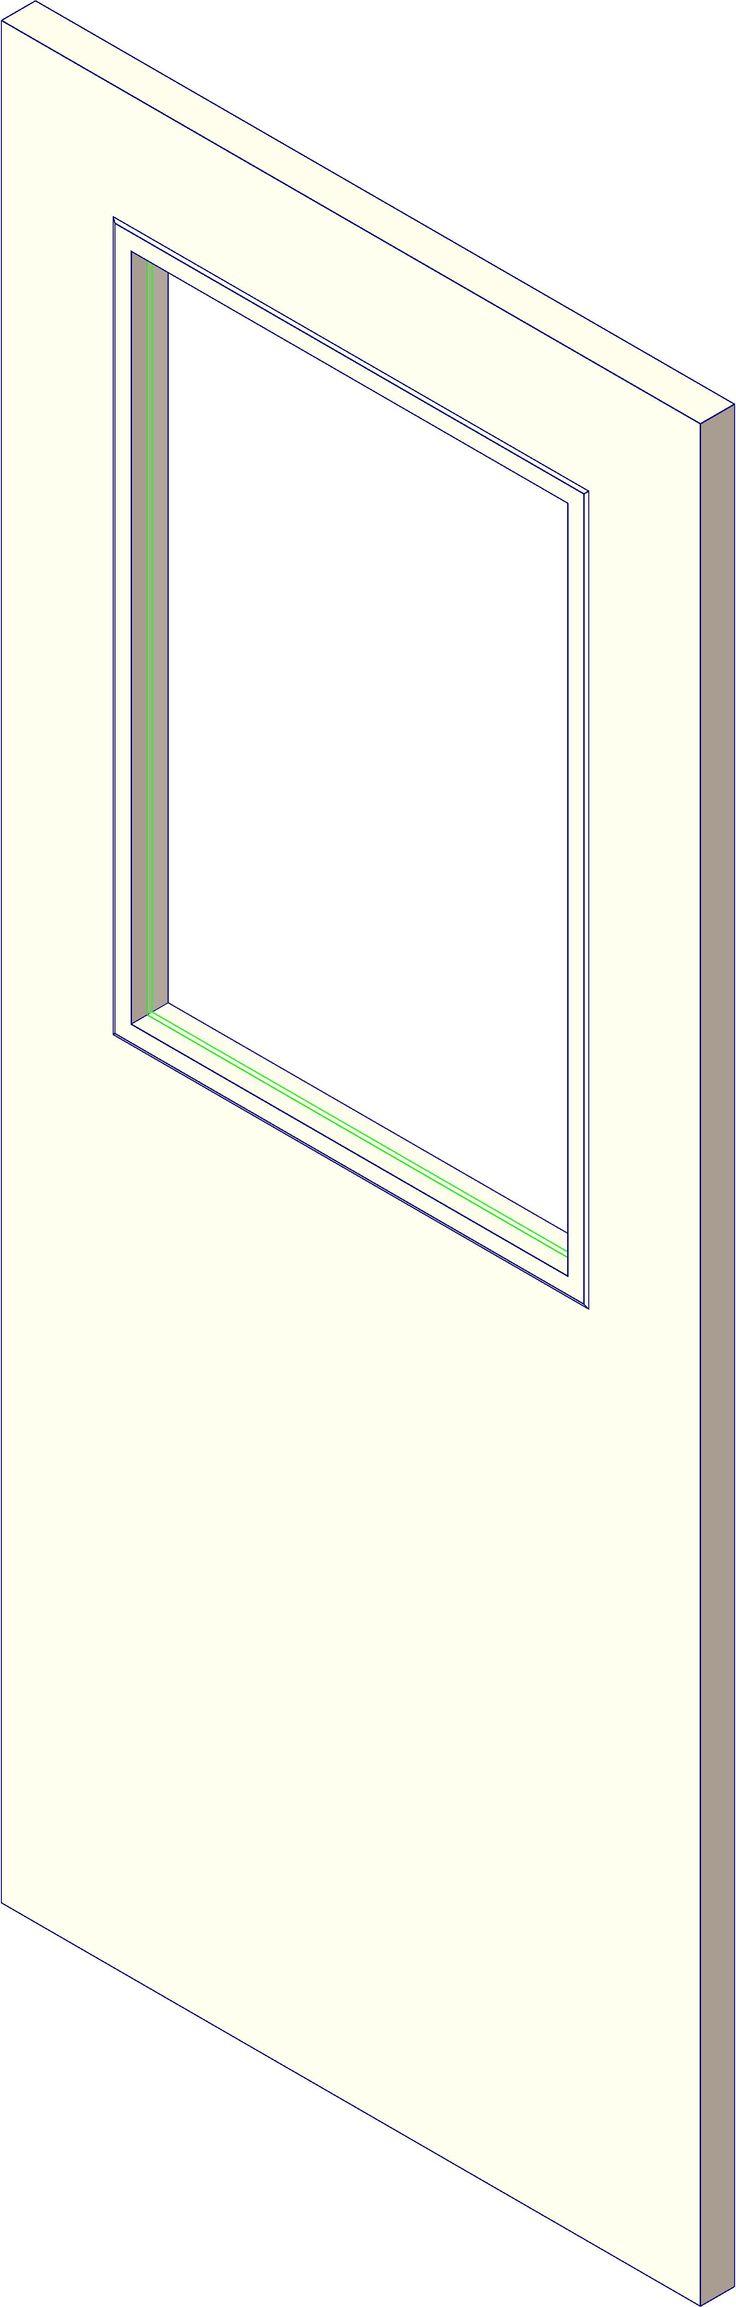 Republic Doors and Frames FEMA 320 | (Software) Revit | Pinterest .  sc 1 st  Lamegapromo.info & Attractive Republic Doors And Frames Collection - Ideas de Marcos ...